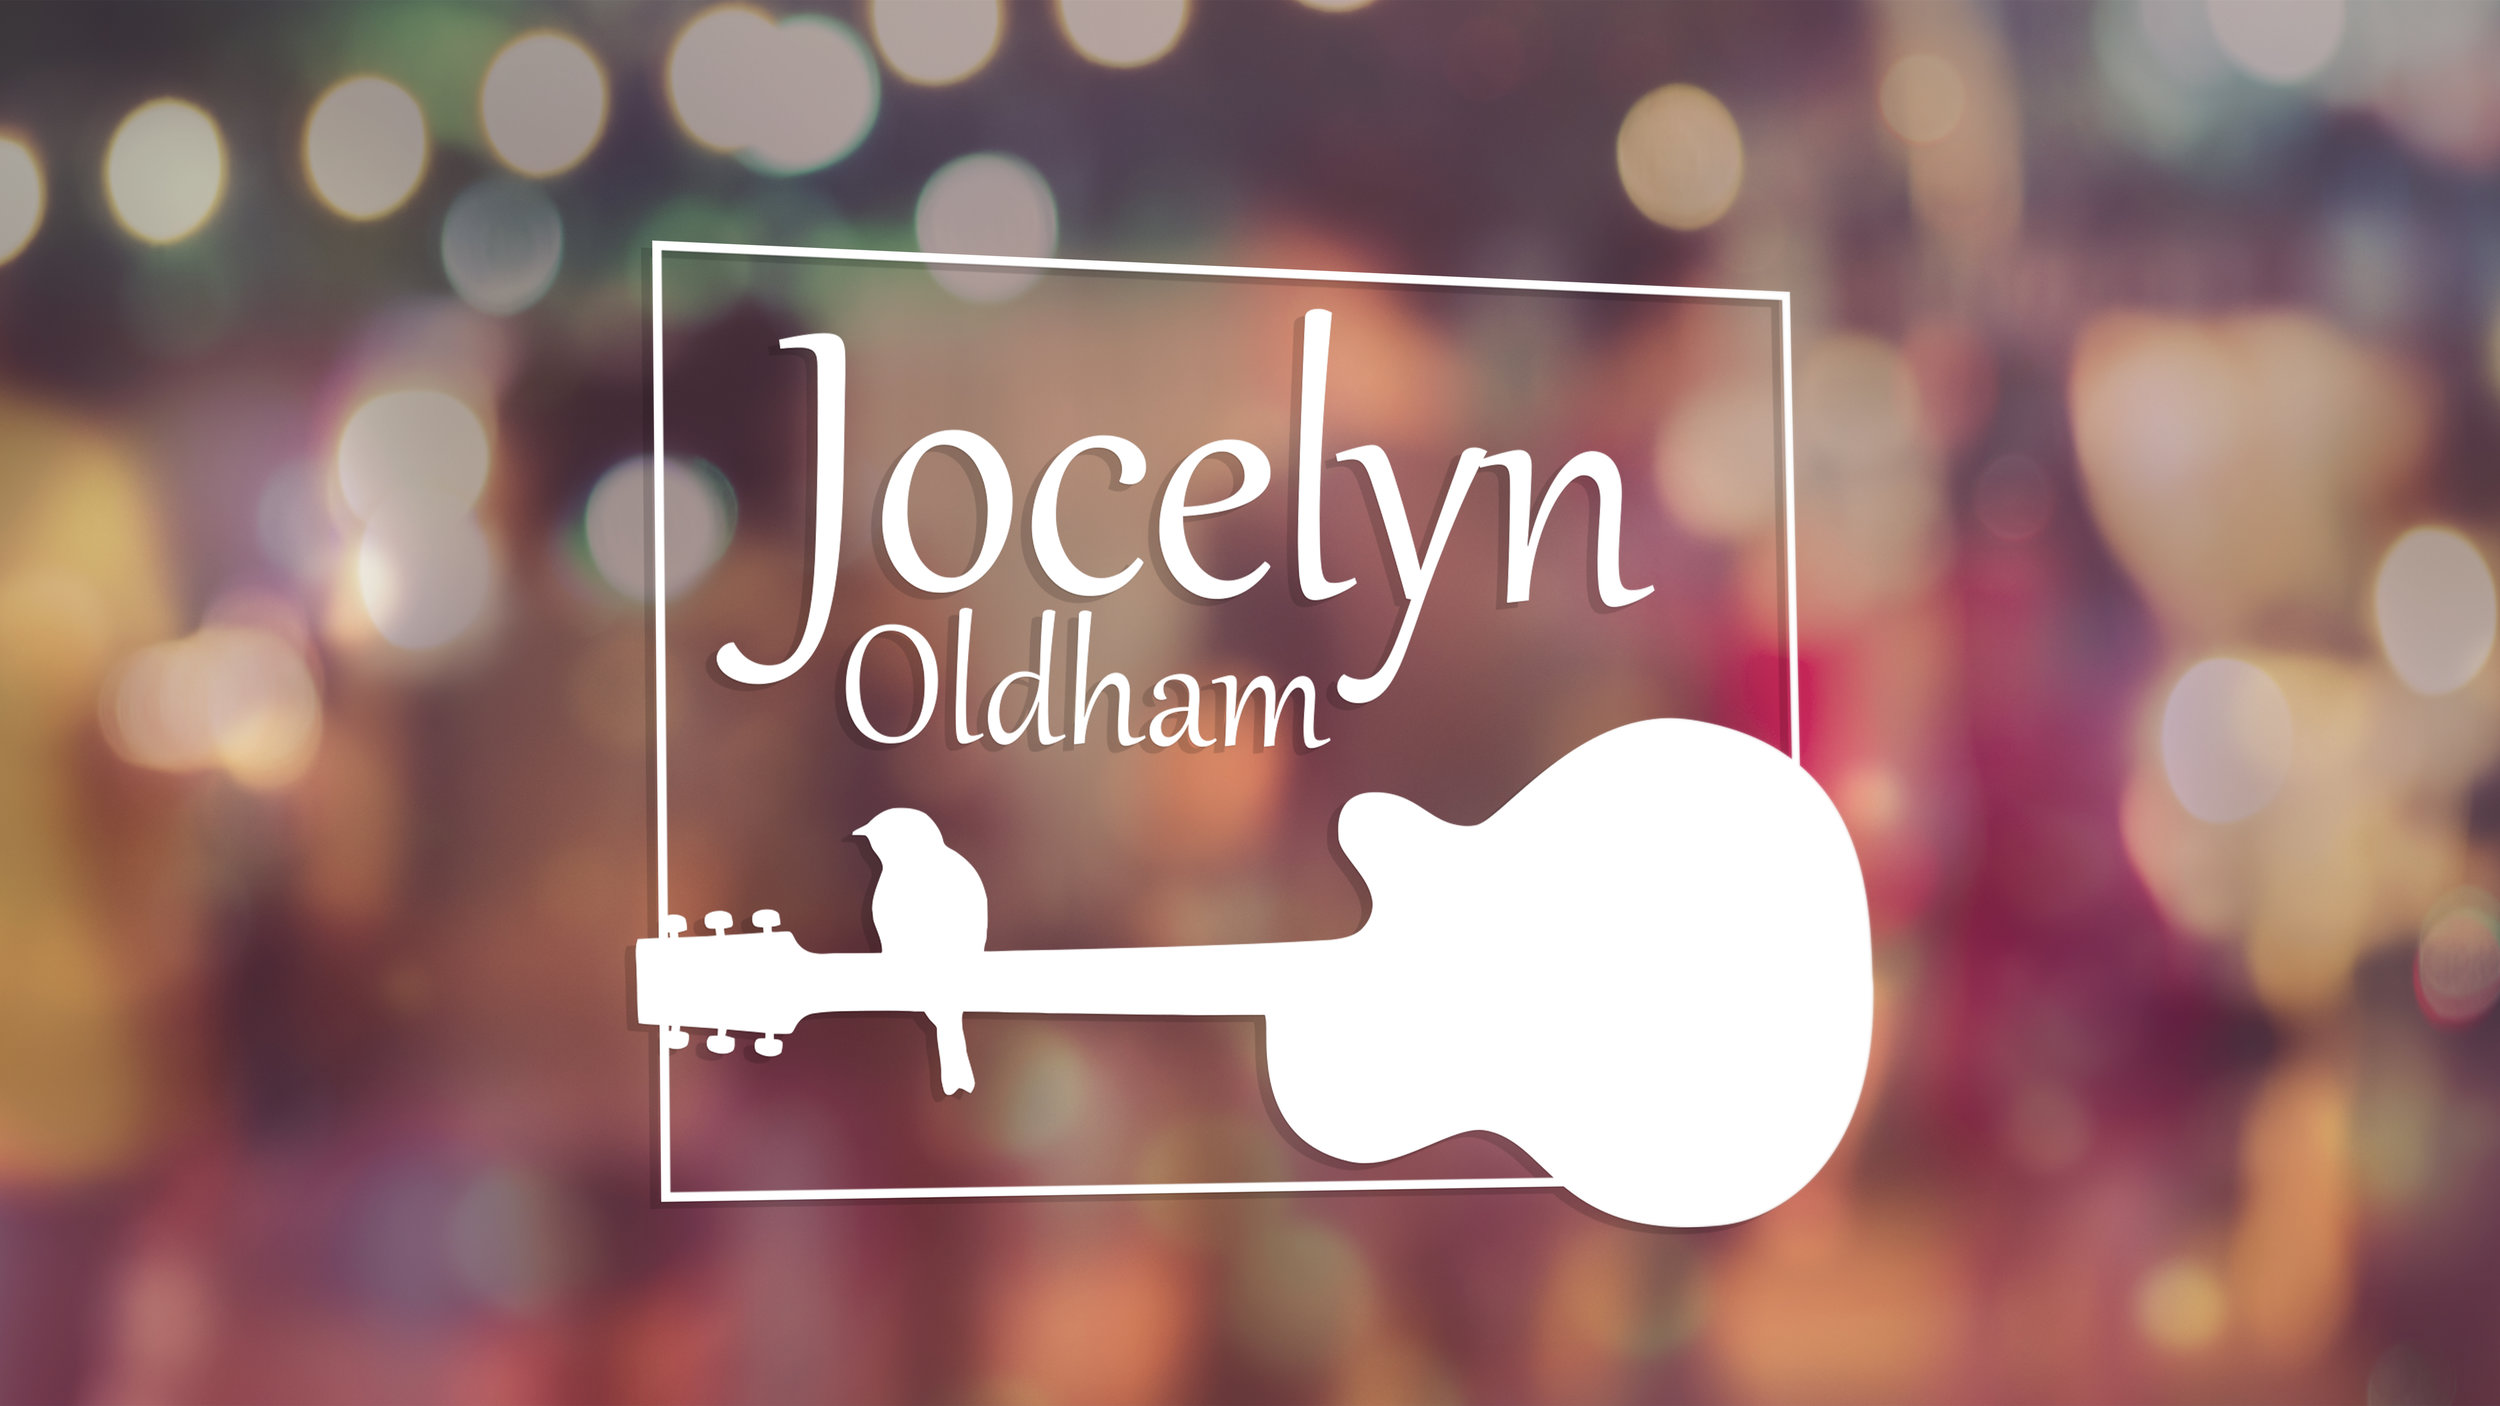 Jocelyn Oldham